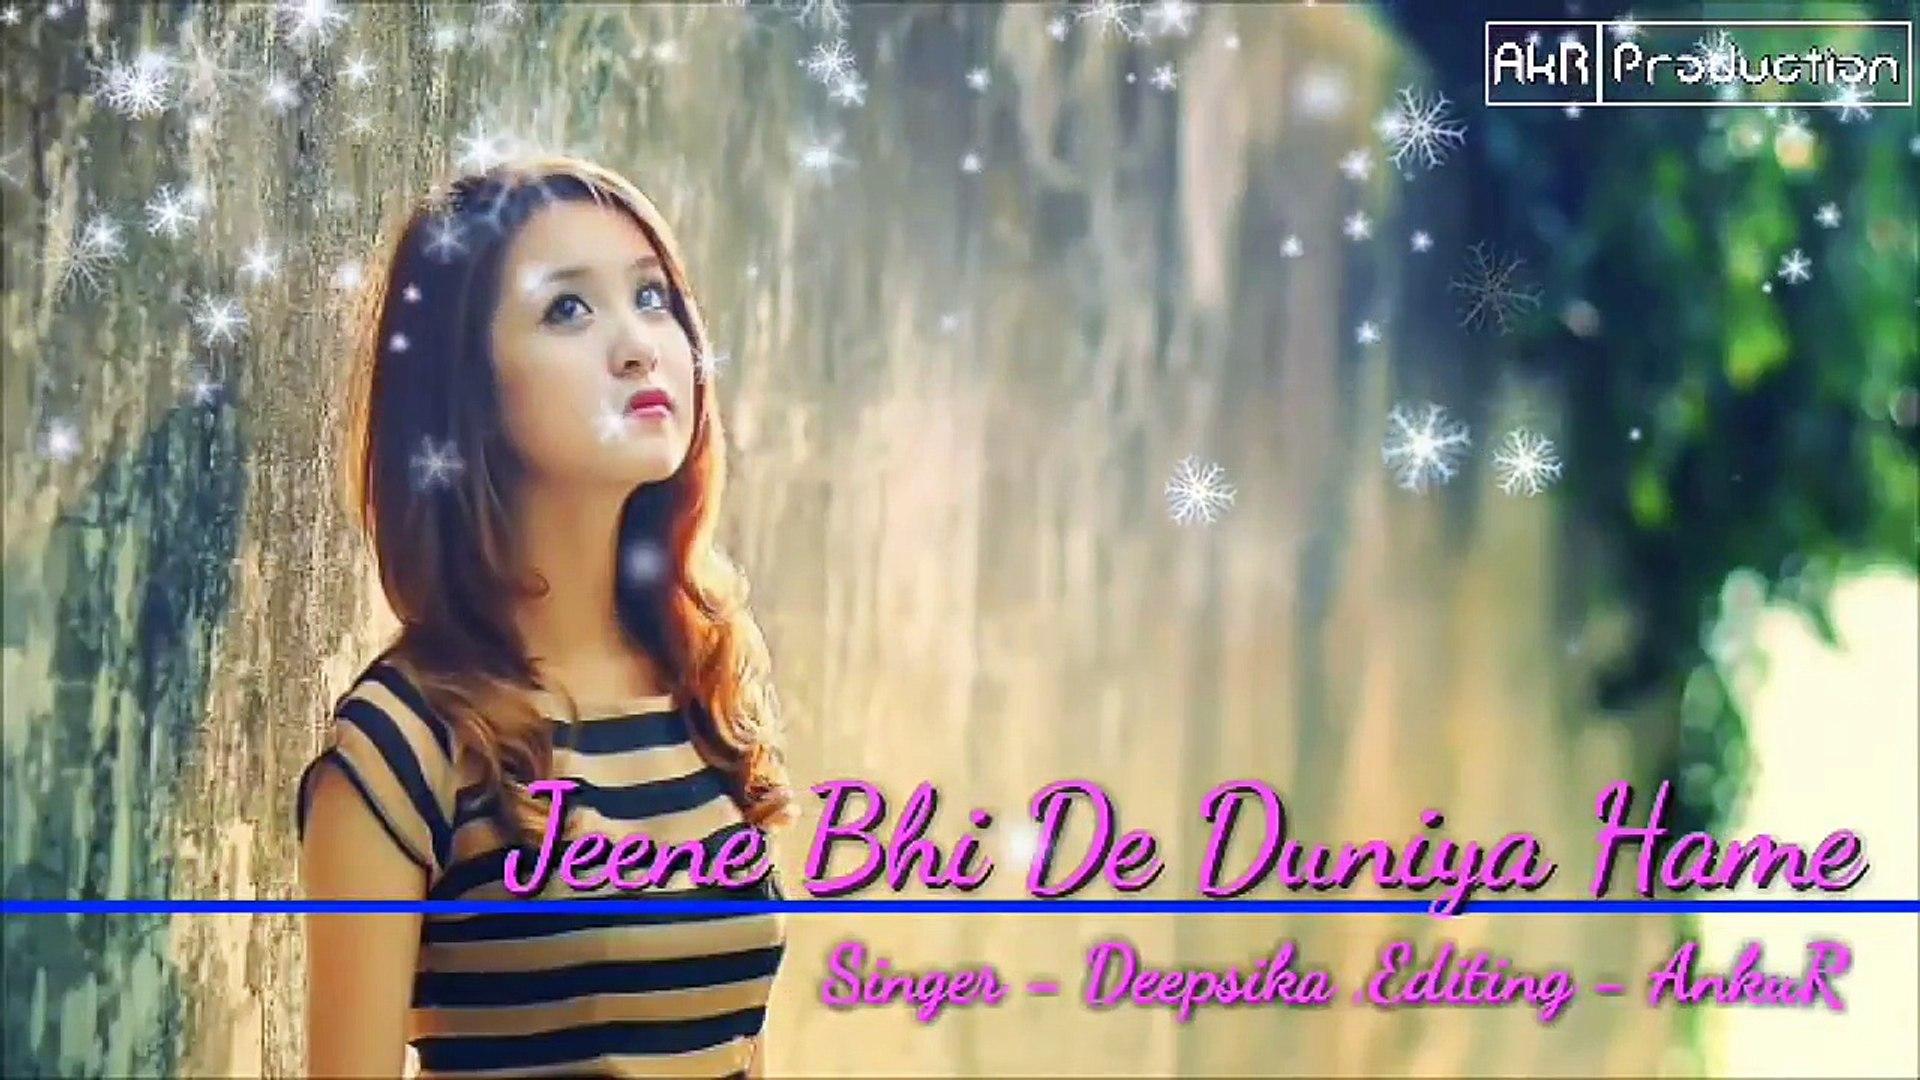 Jeene Bhi De Duniya Hume Lyrics Very Very Hart Tucing Love Song 2018 Video Dailymotion